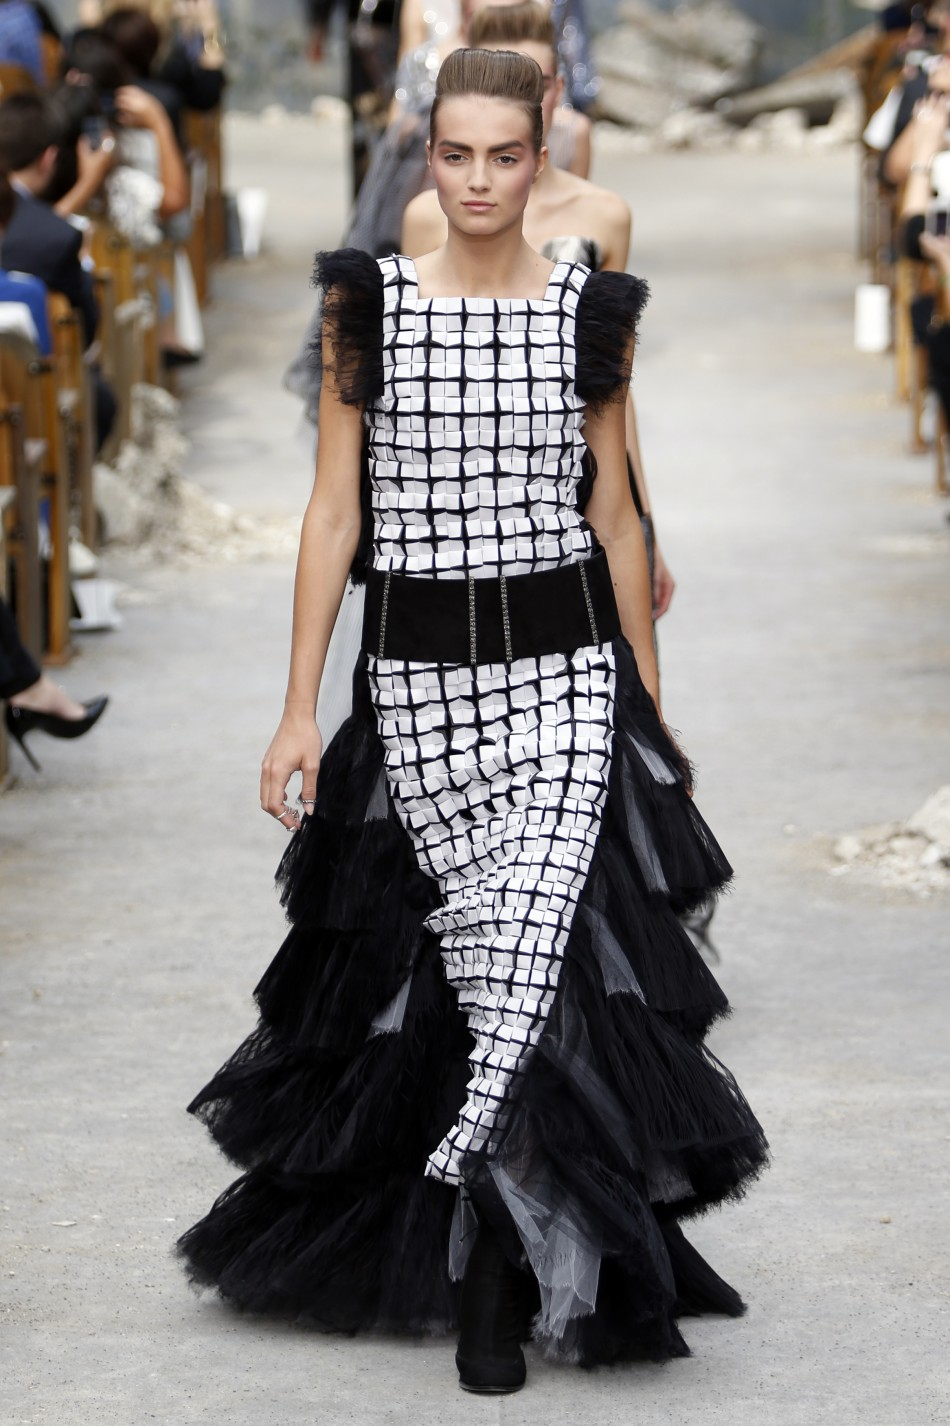 Paris fashion week 2013 kristen stewart rihanna stun at for American haute couture designers